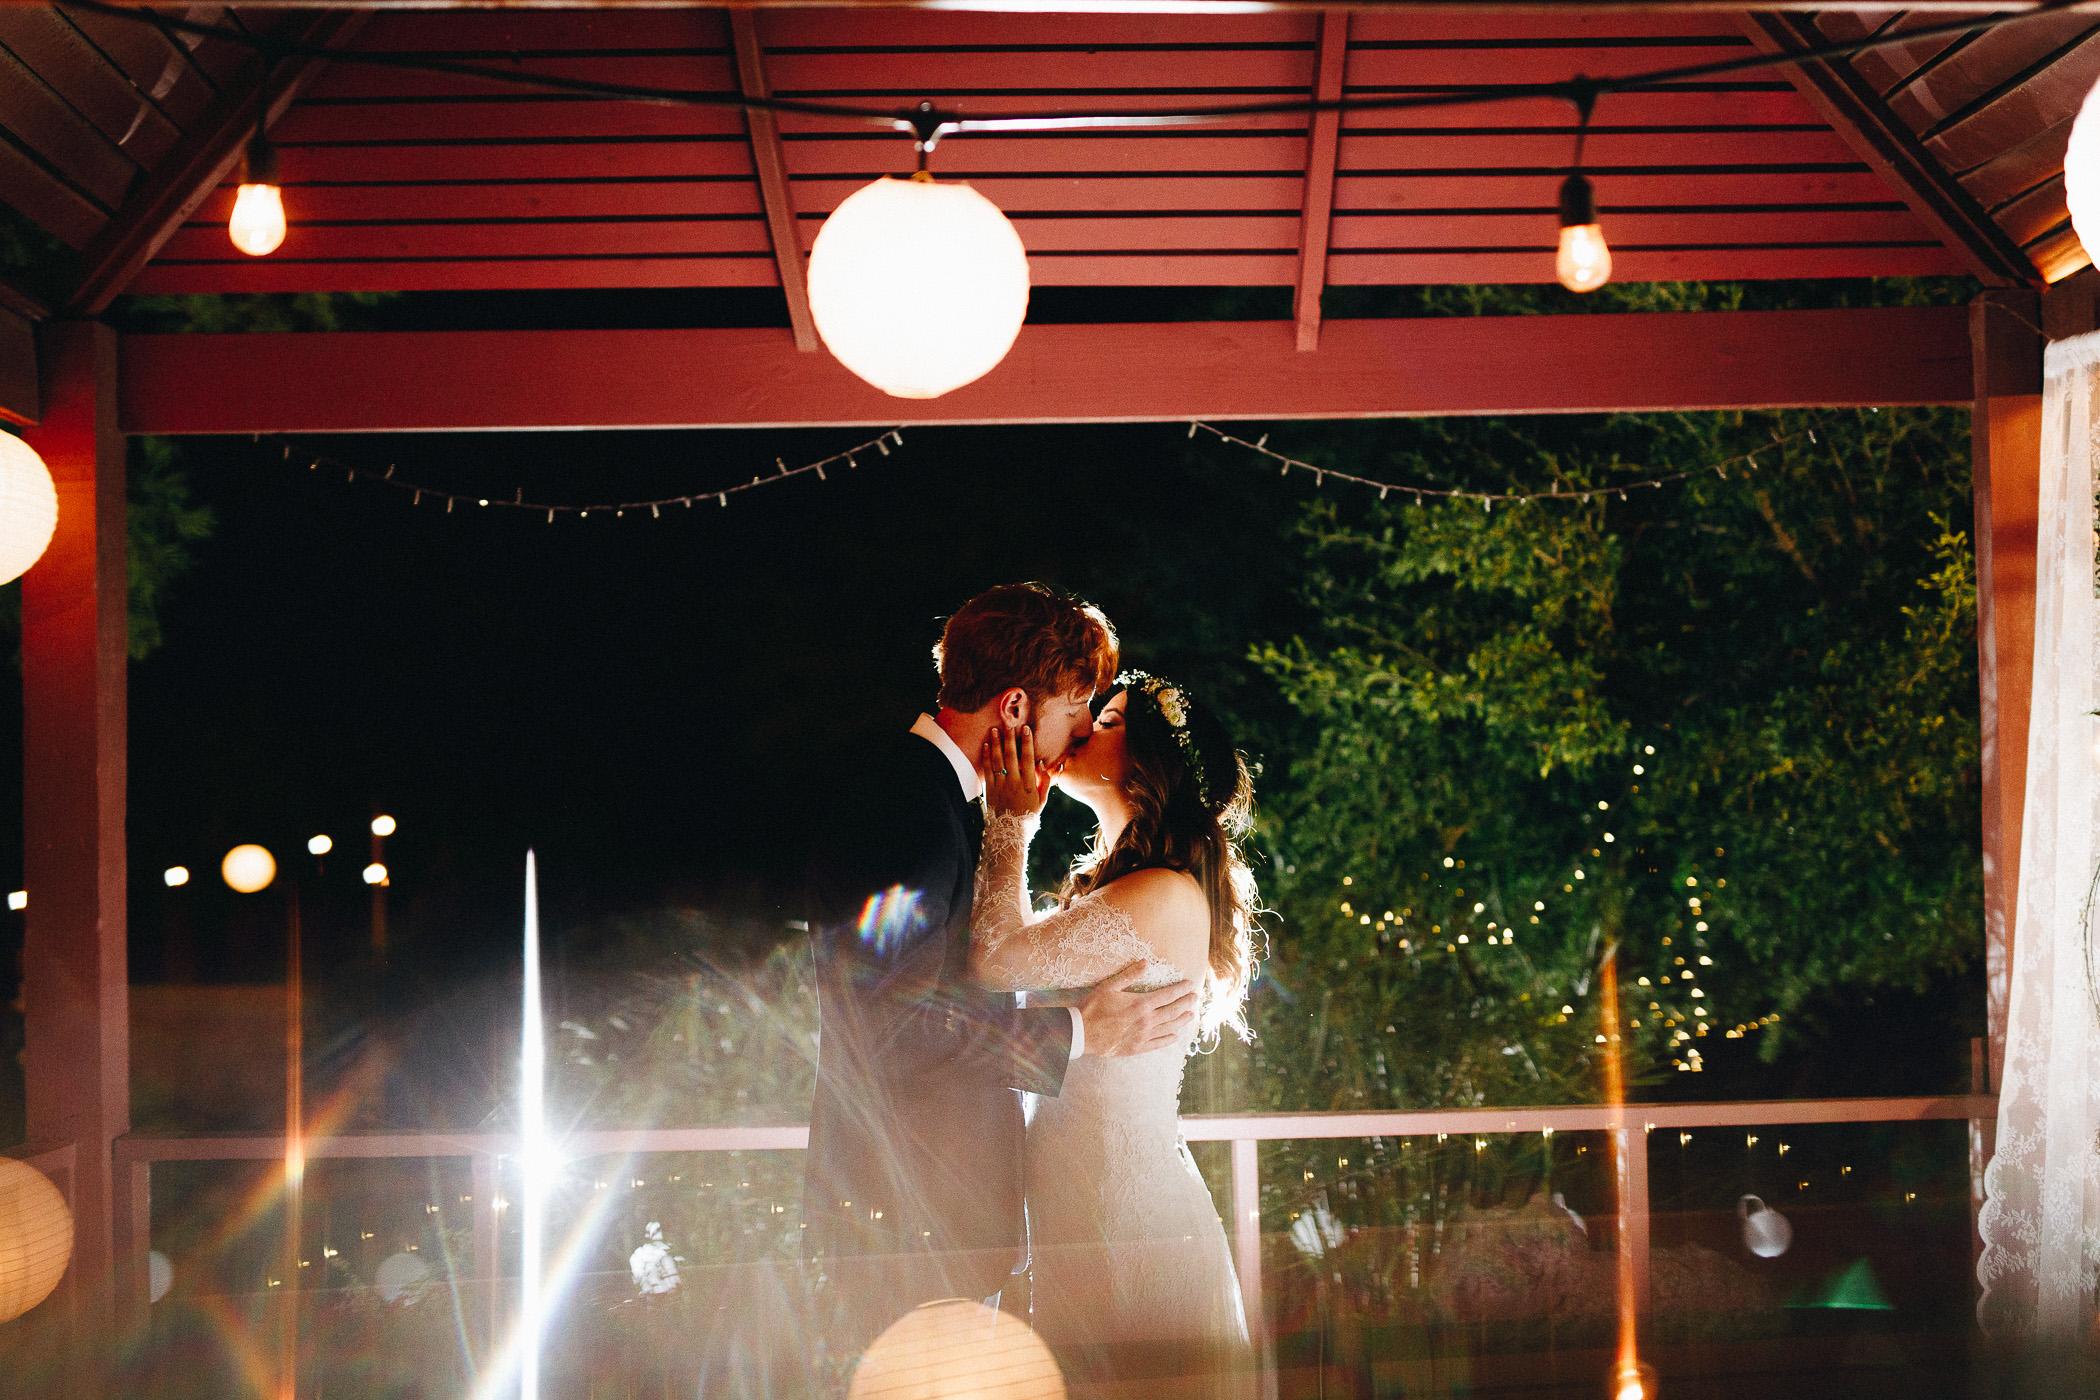 181104-Luxium-Weddings-Arizona-@matt__Le-Brandon-Kariana-Phoenix-Valley-Garden-Center-1151.jpg